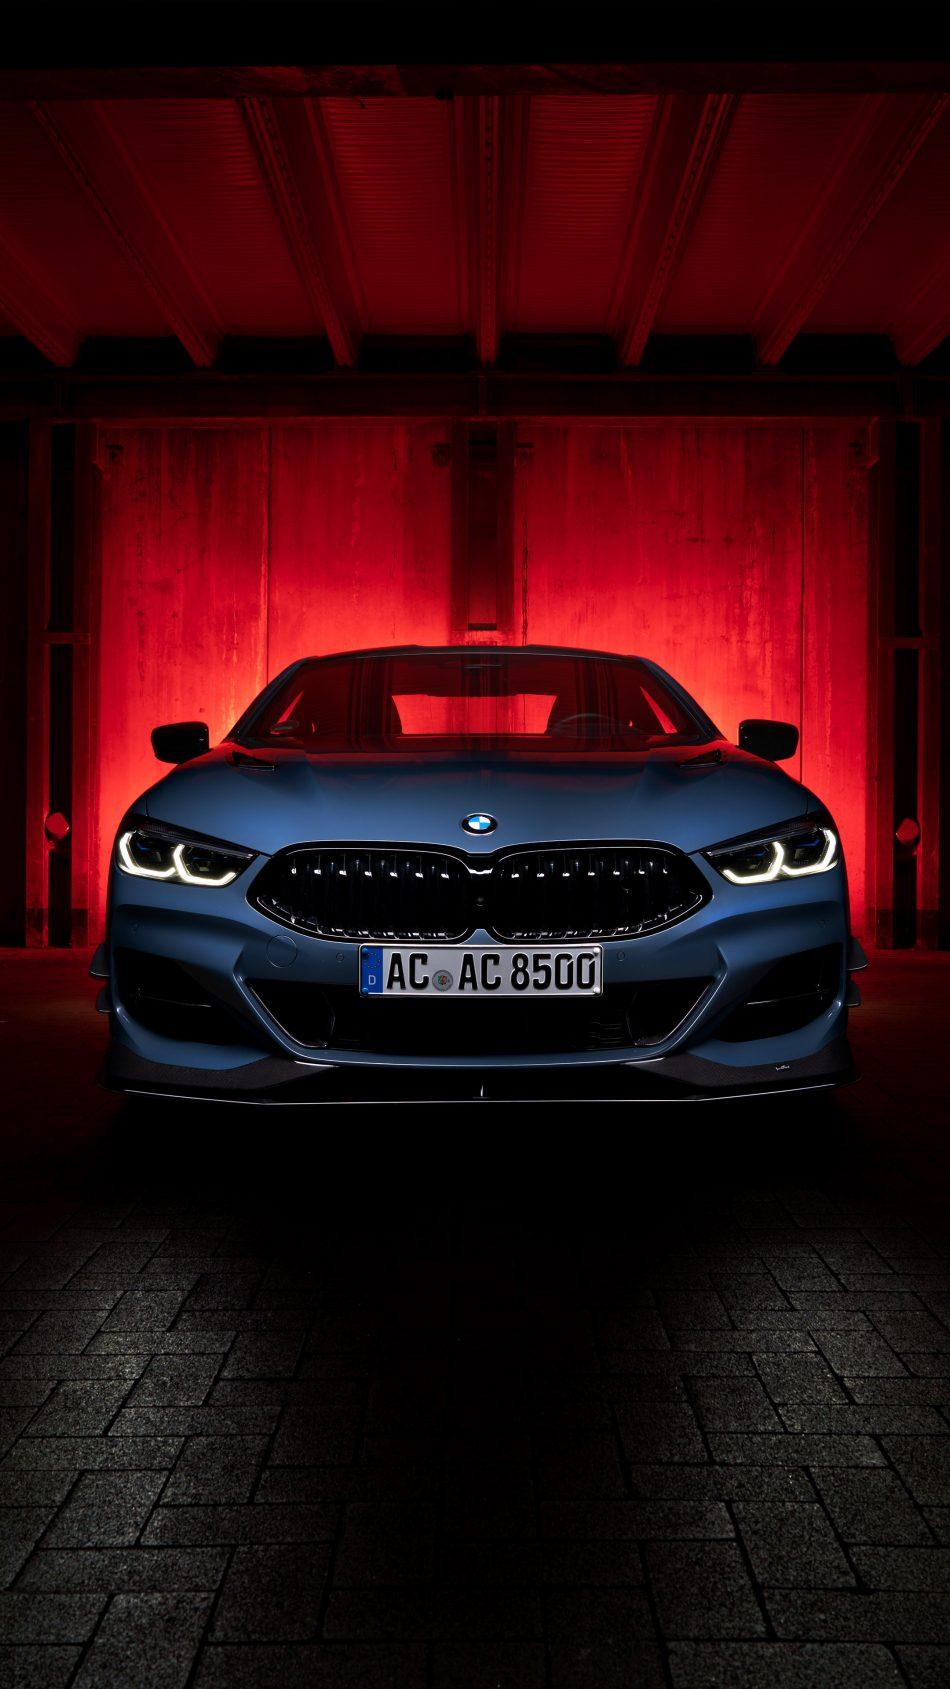 BMW i8 AC Schnitzer ACS8 4K Ultra HD Mobile Wallpaper